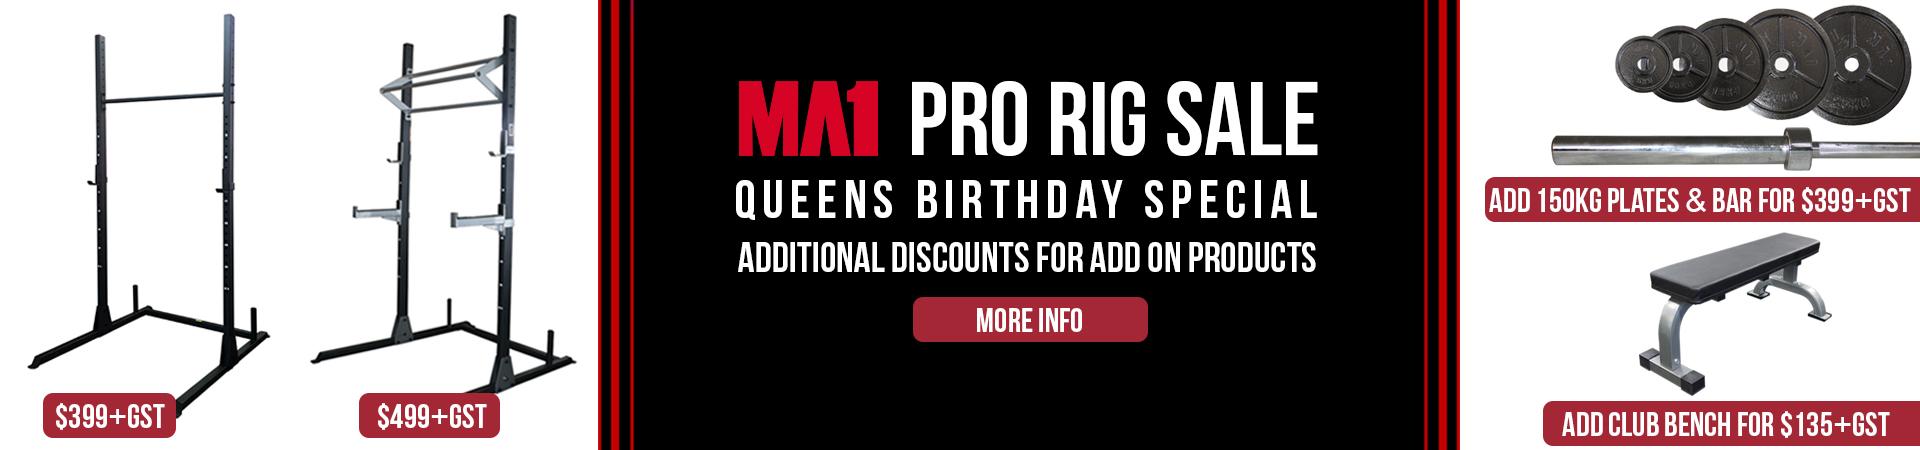 Queens Birthday MA1 Pro Rig Sale